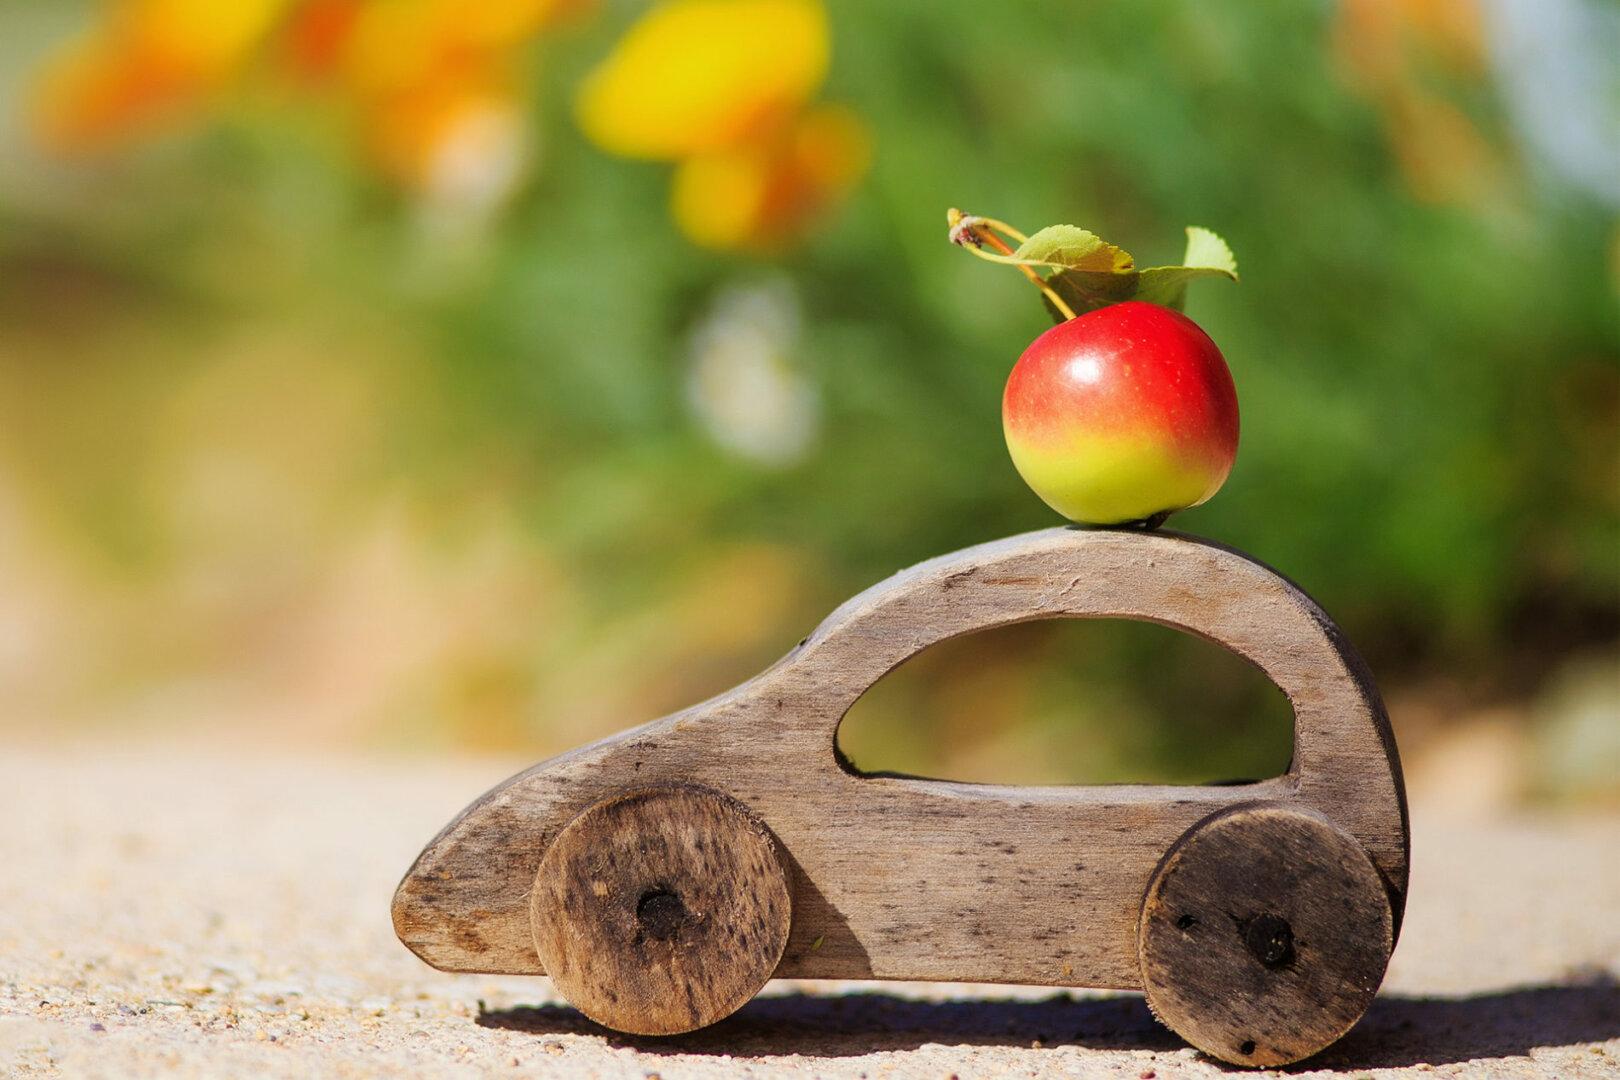 Holzauto mit Apfel auf dem Dach